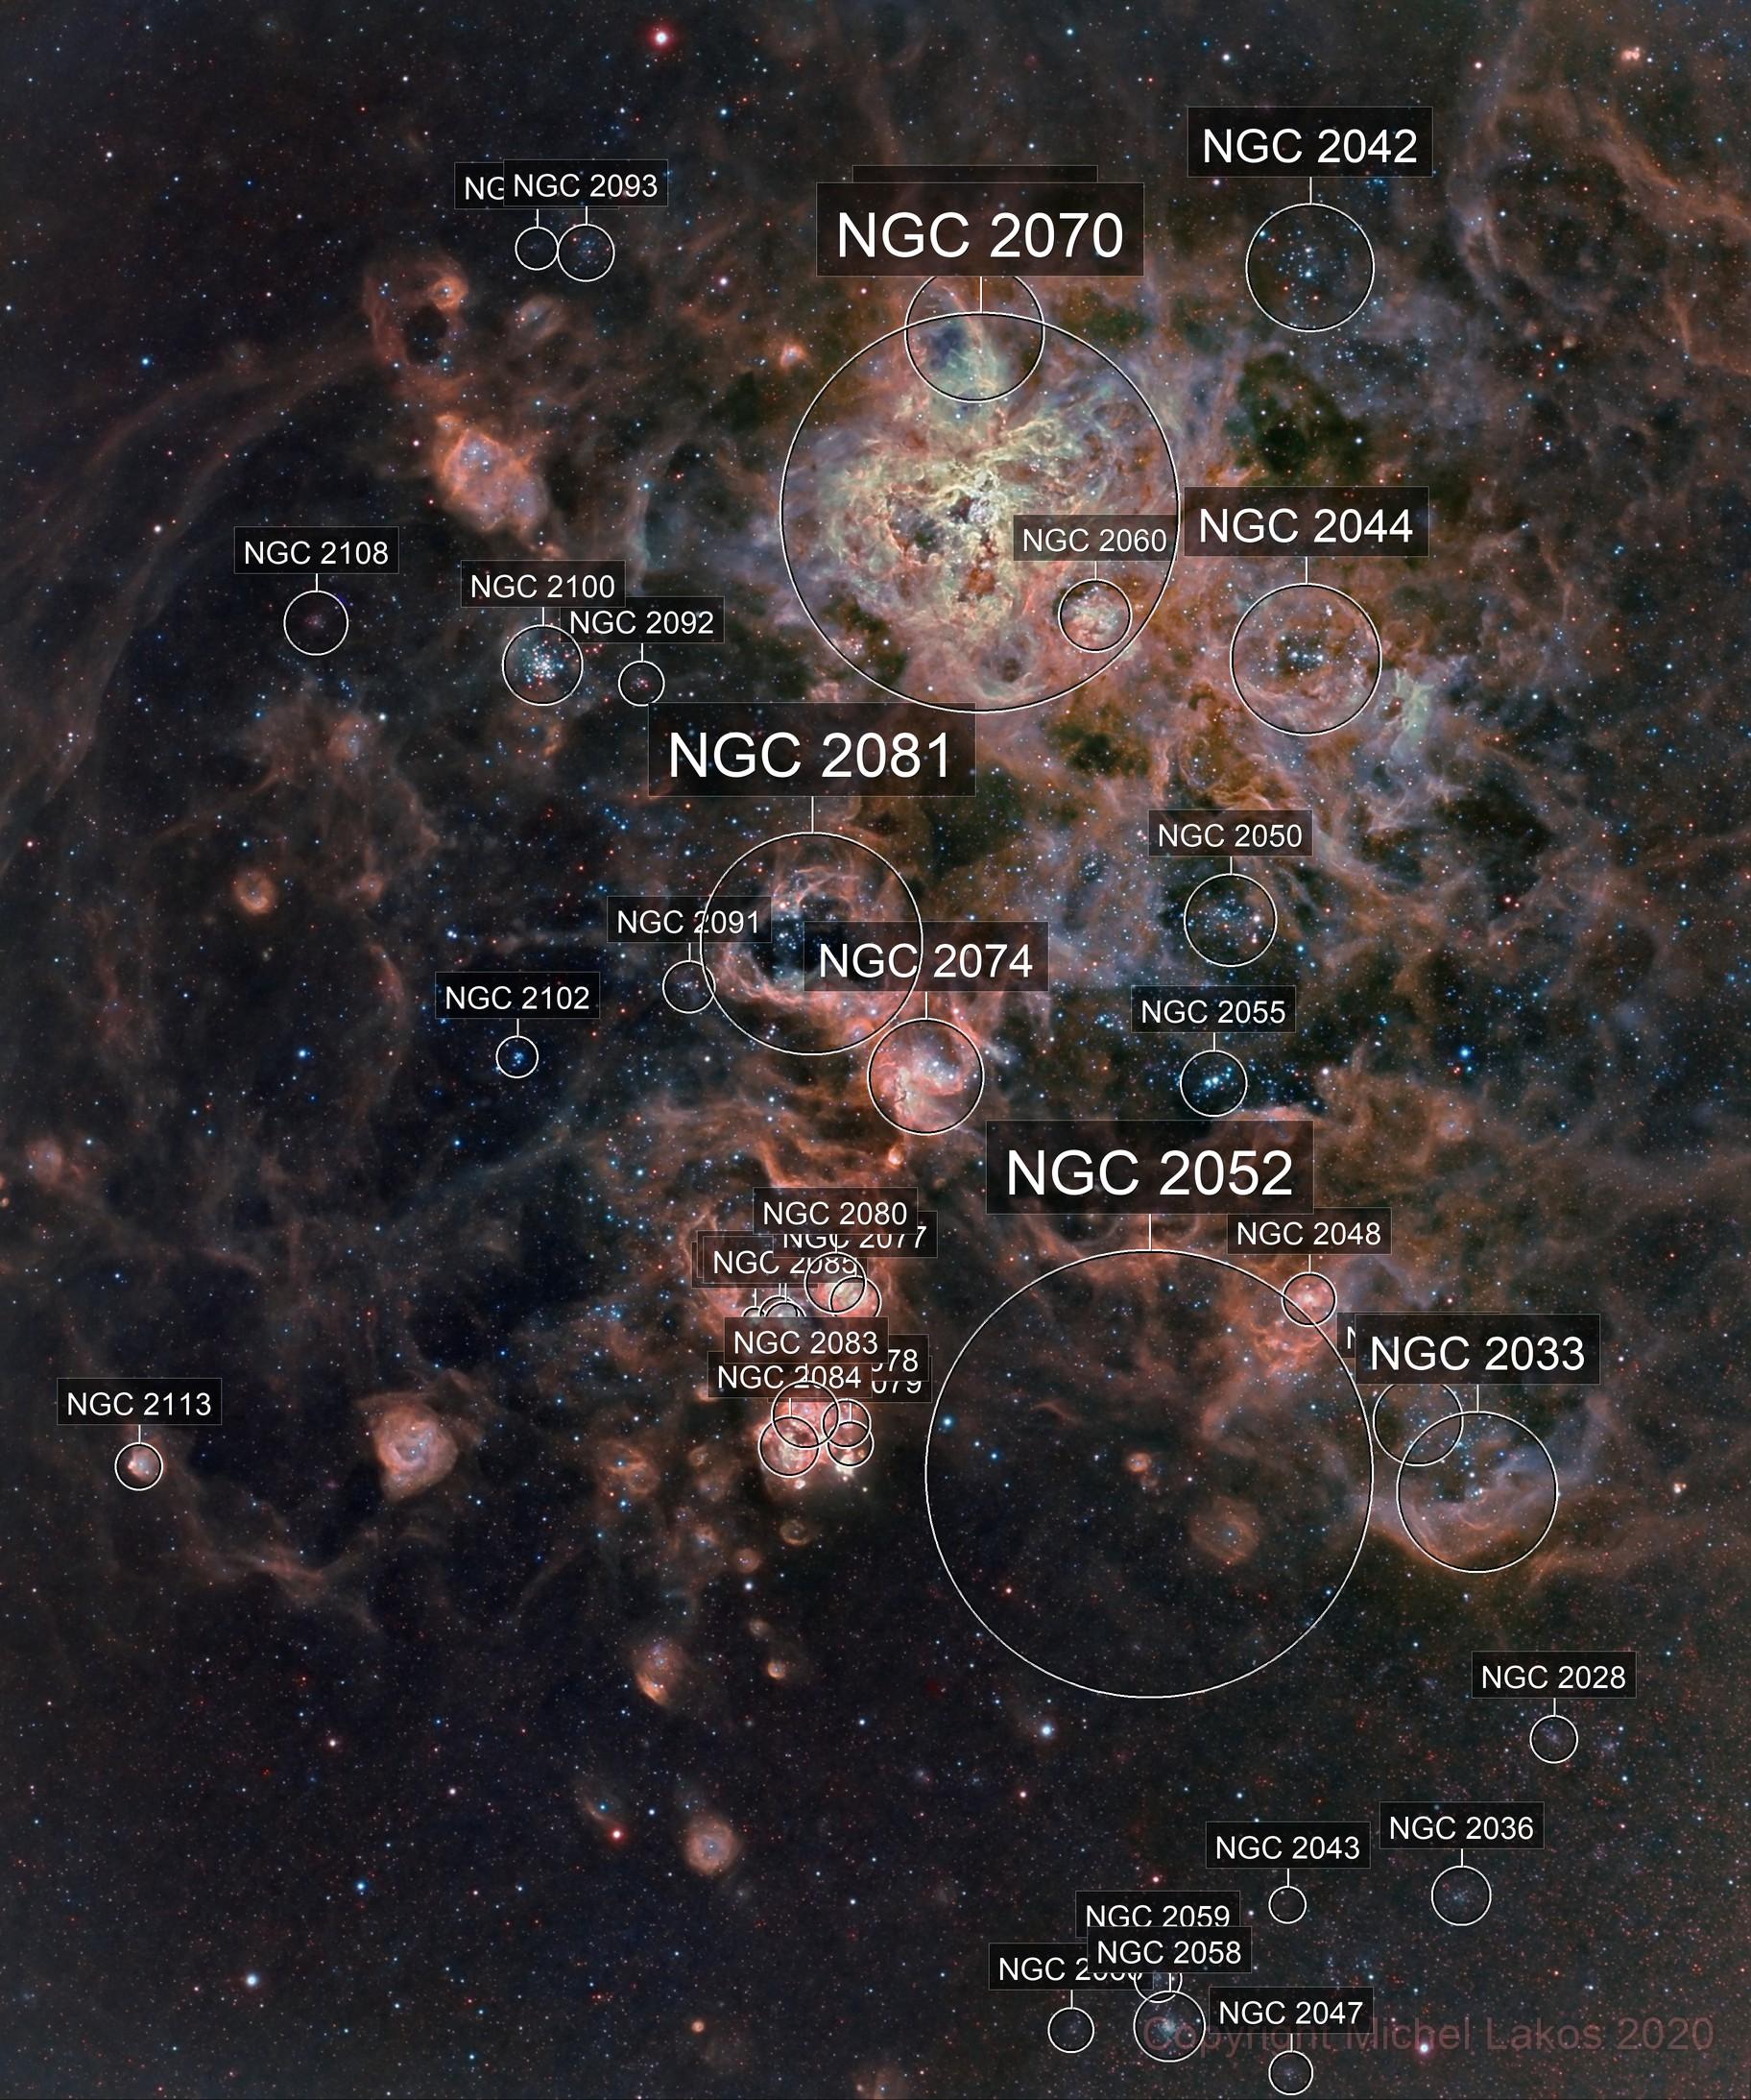 NGC 2070 Tarantula Nebula - LMC